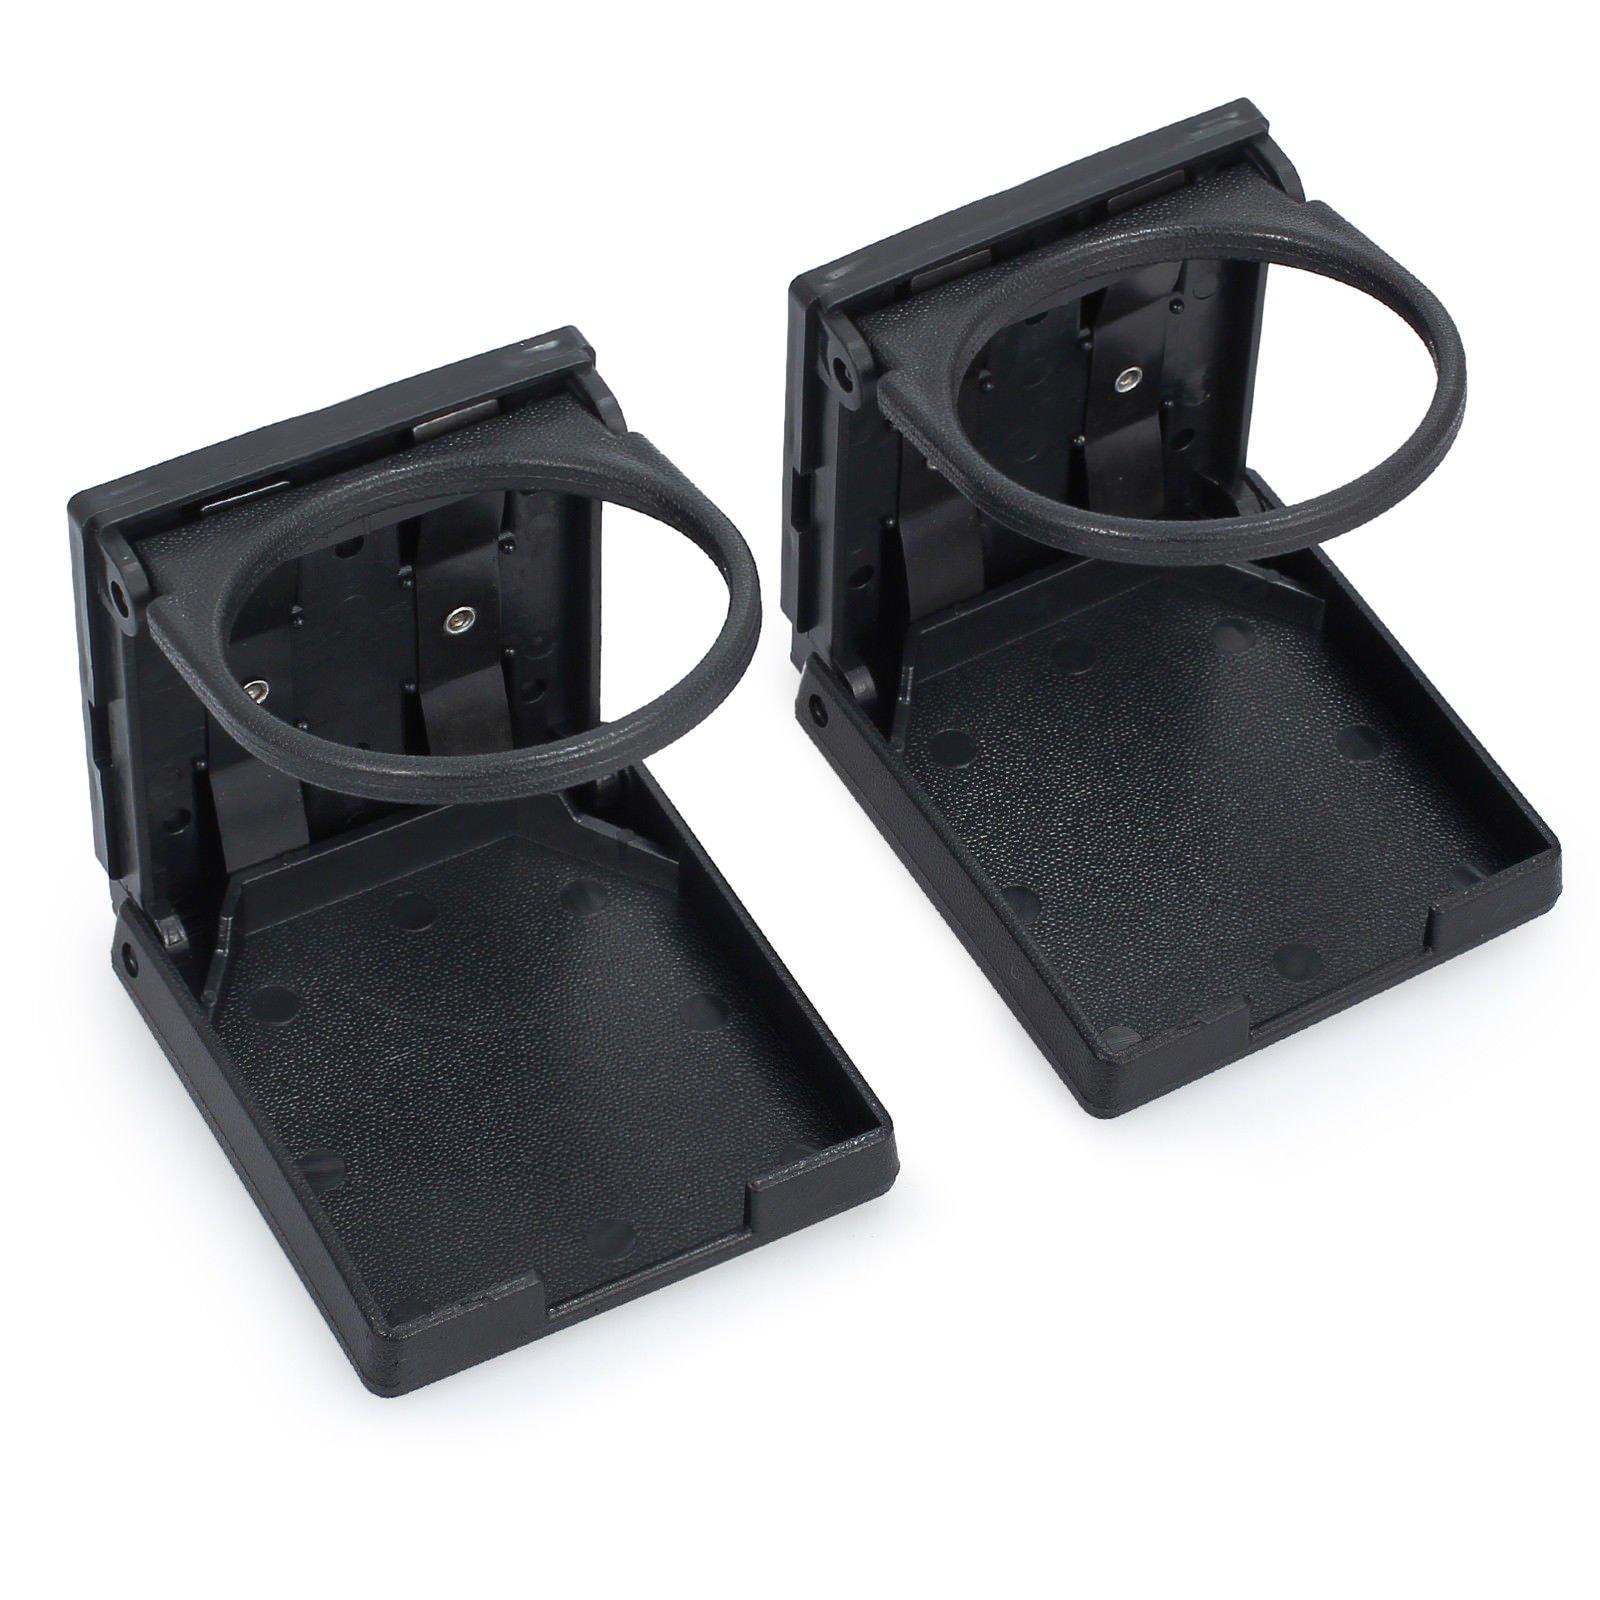 AUTOUTLET 2PCS Universal Adjustable Folding Cup Drink Holder Waterproof Cans Plastic Holders Portable 75MM Diameter for Car Truck Boat Van, Corrosion-Resistant